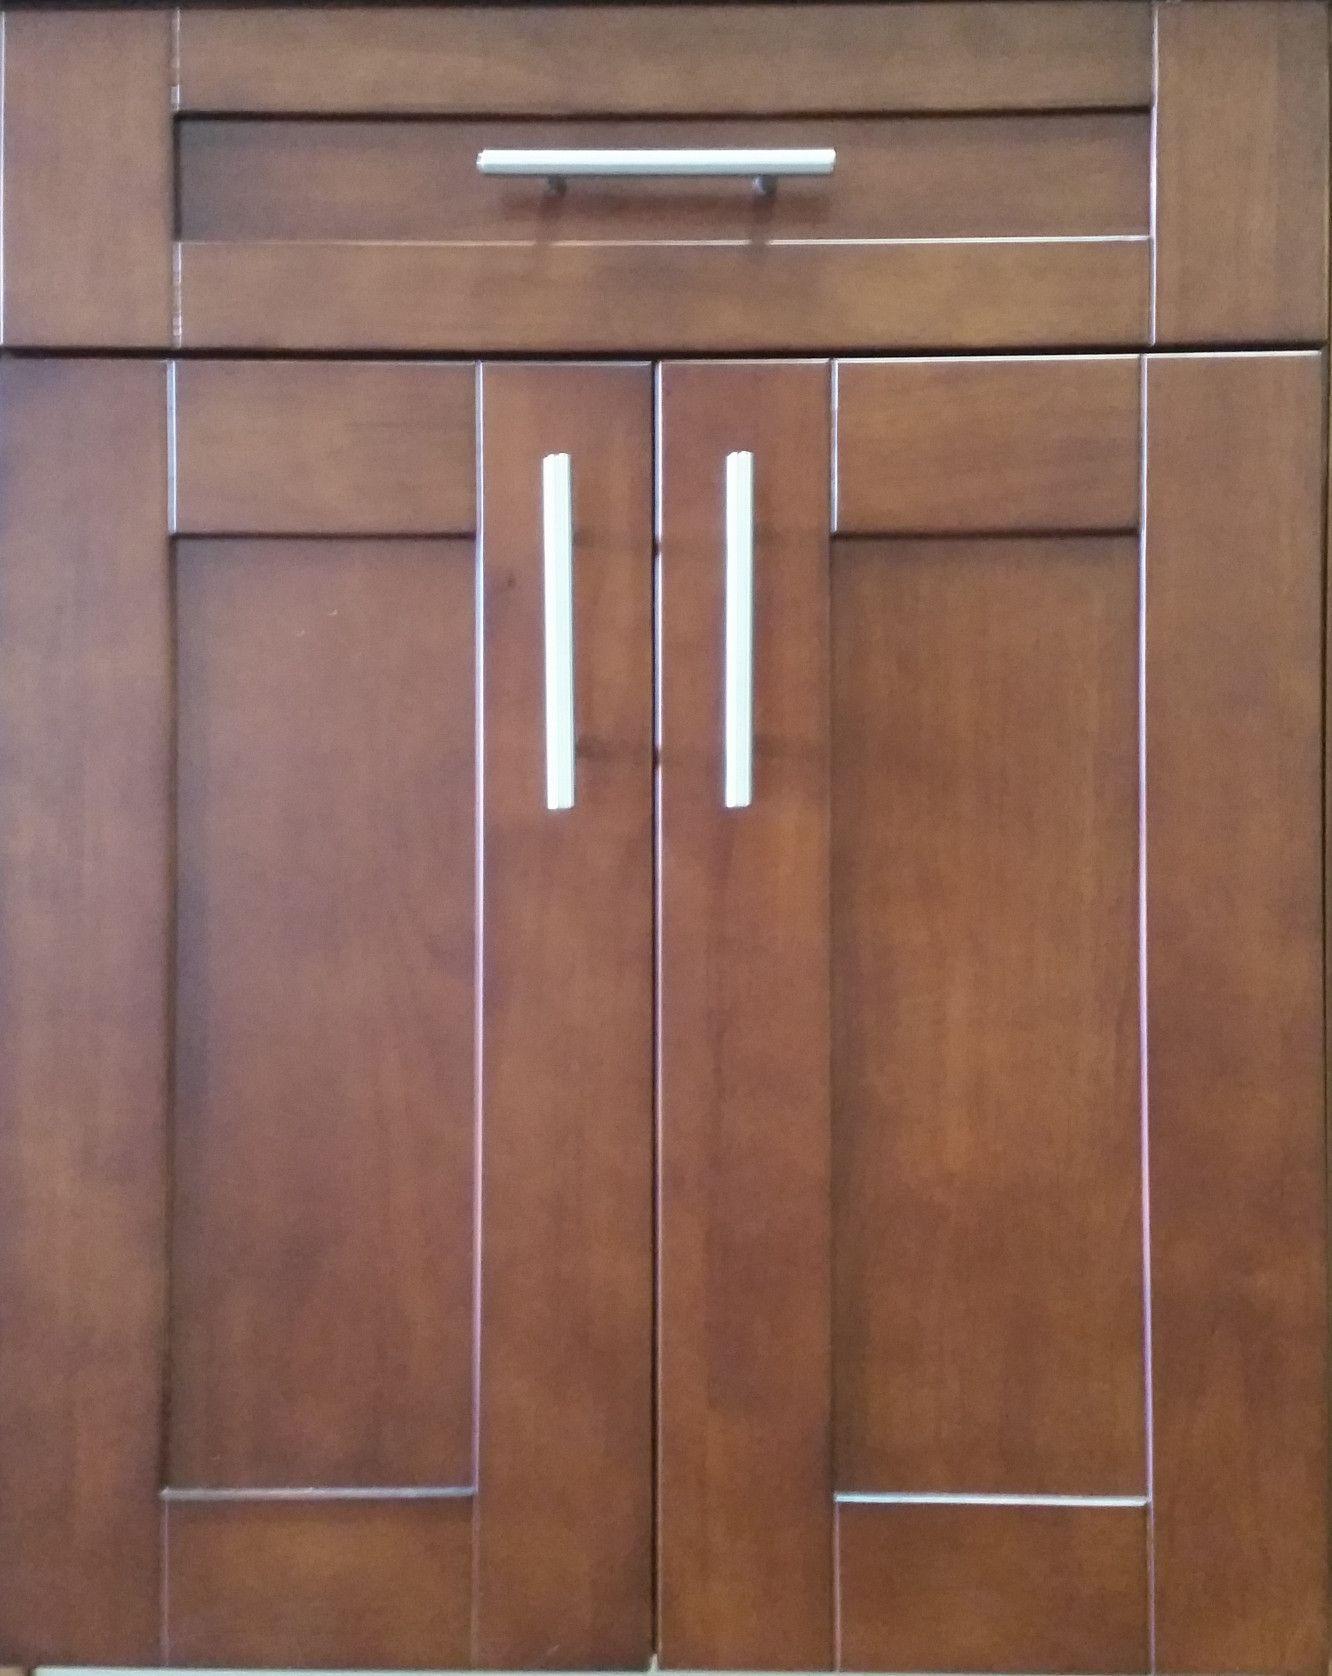 2018 Mdf Cabinet Doors Online Kitchen Floor Vinyl Ideas Check More At Http Www Planetgreens Kitchen Cabinet Door Styles Kitchen Cabinet Doors Cabinet Doors